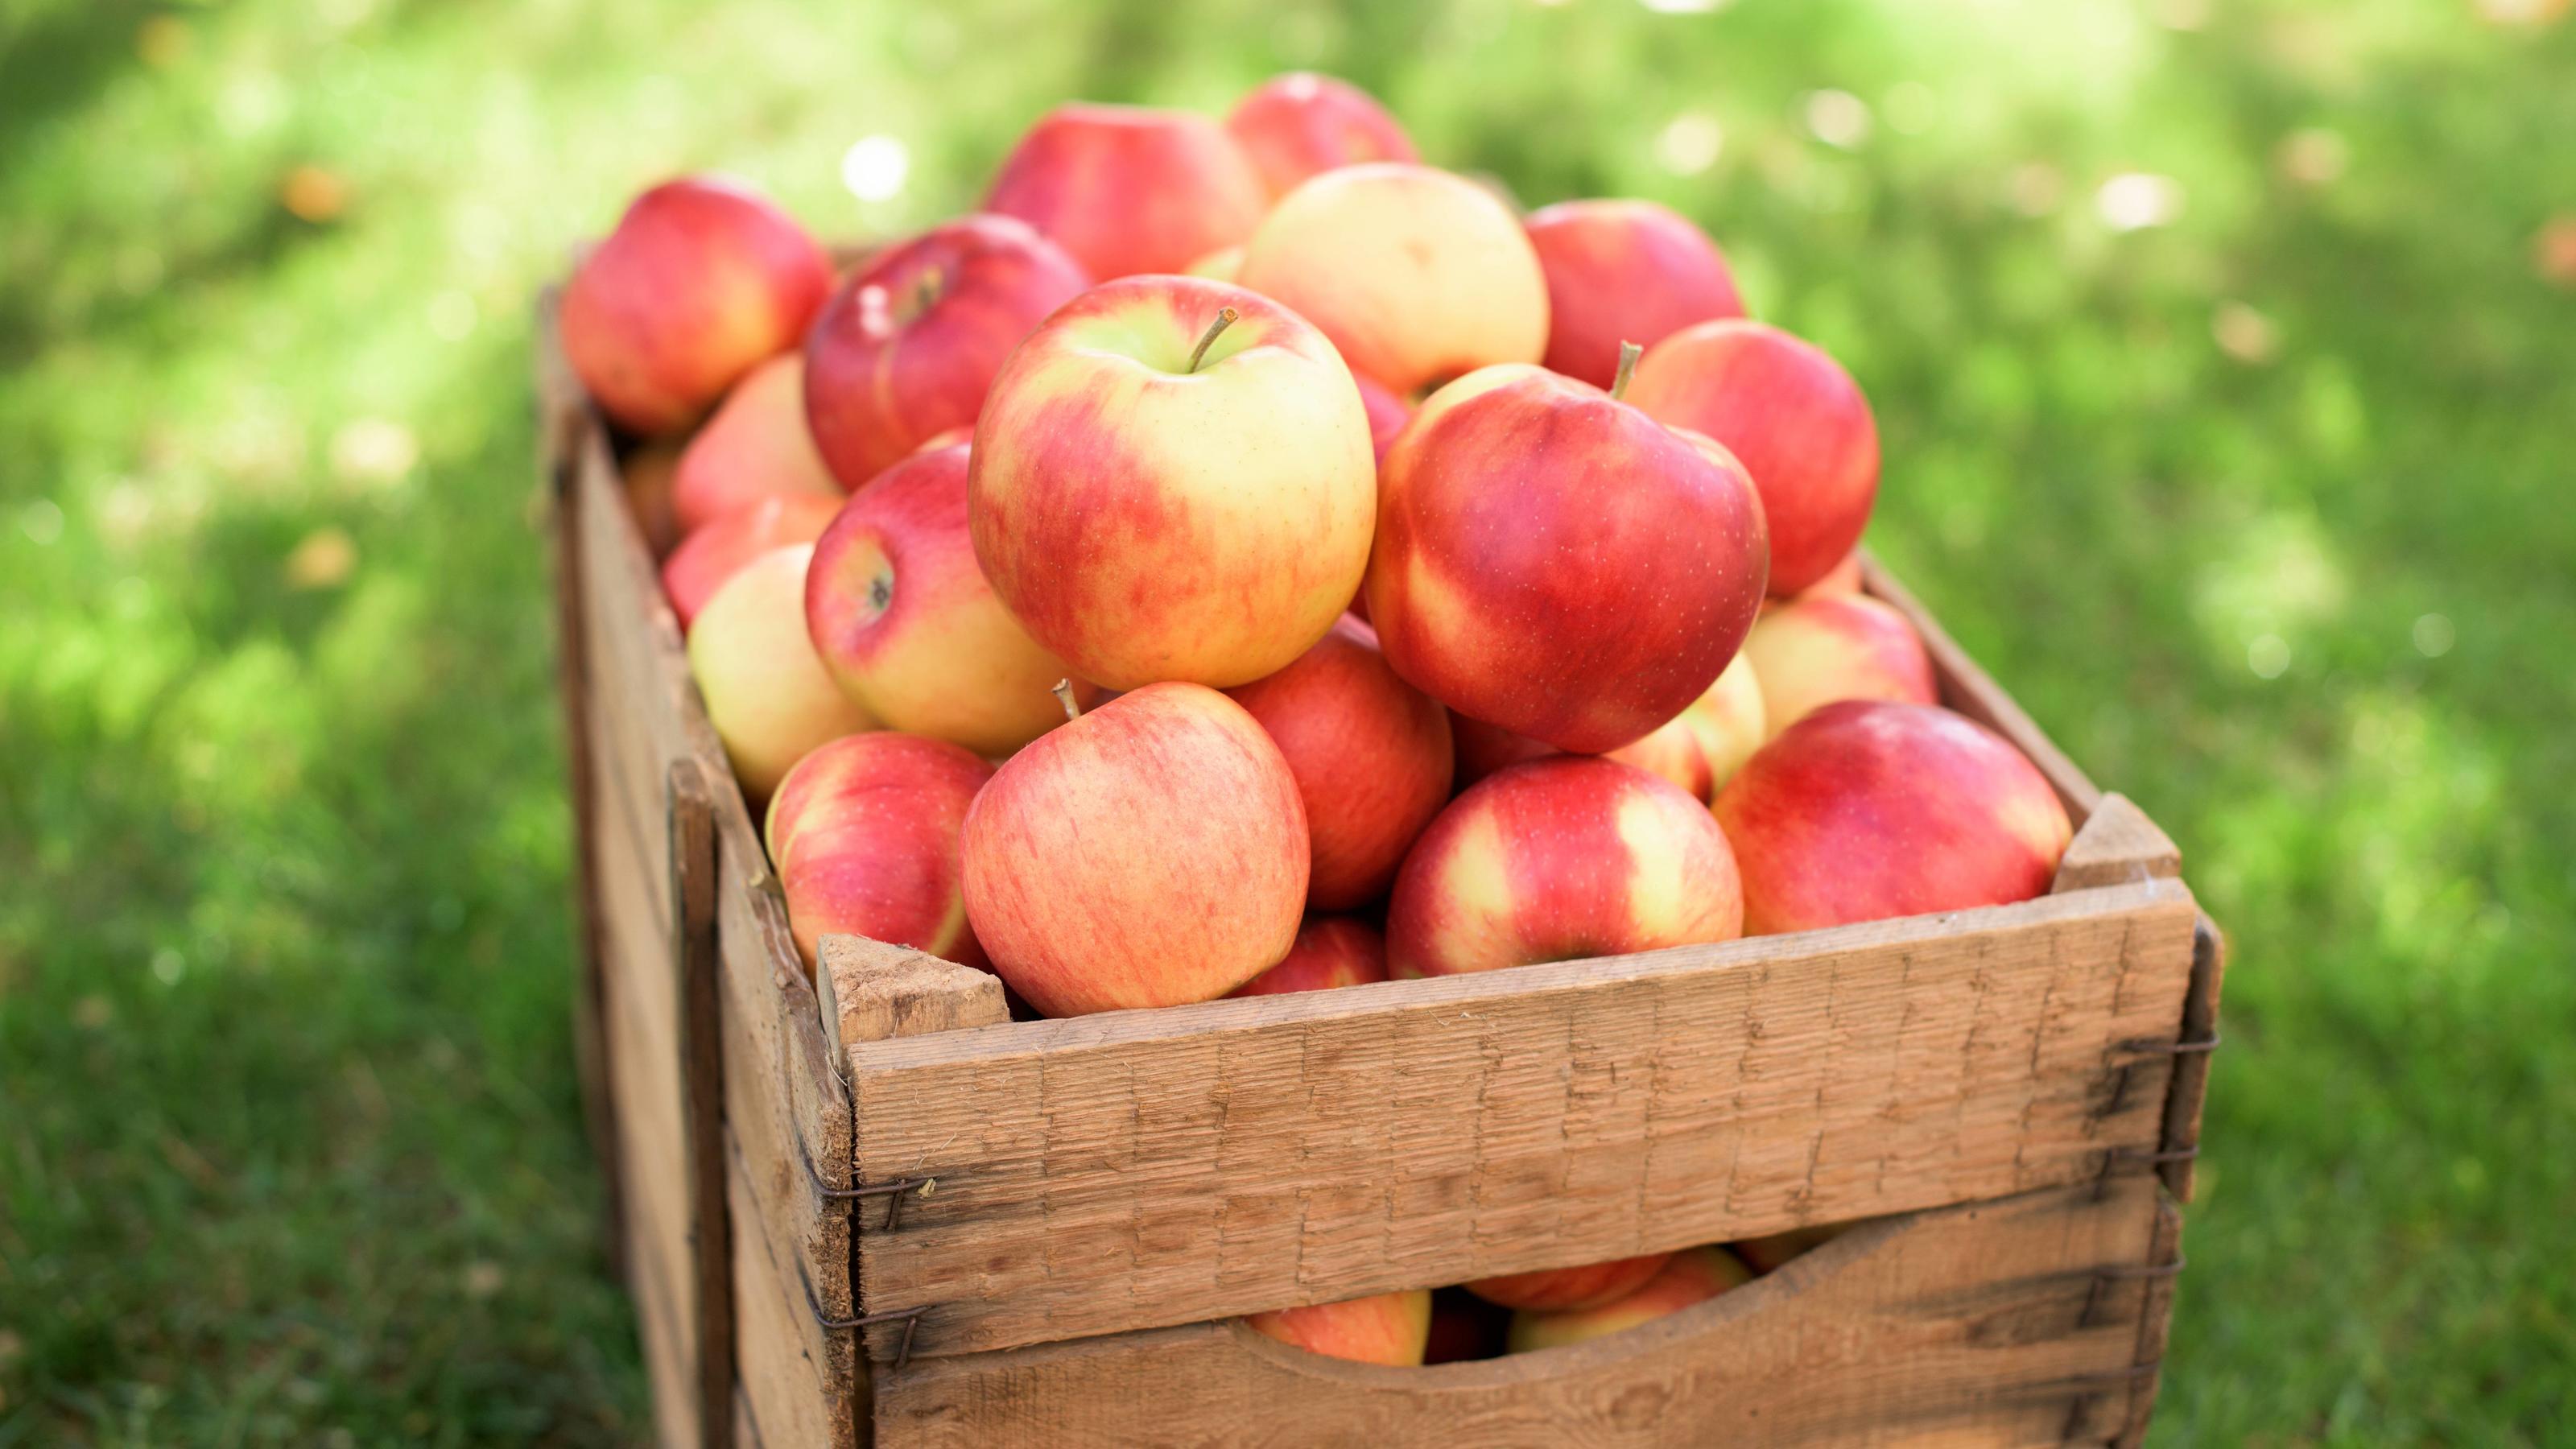 rote Äpfel *** red apples PUBLICATIONxINxGERxSUIxAUTxONLY photocase2210421